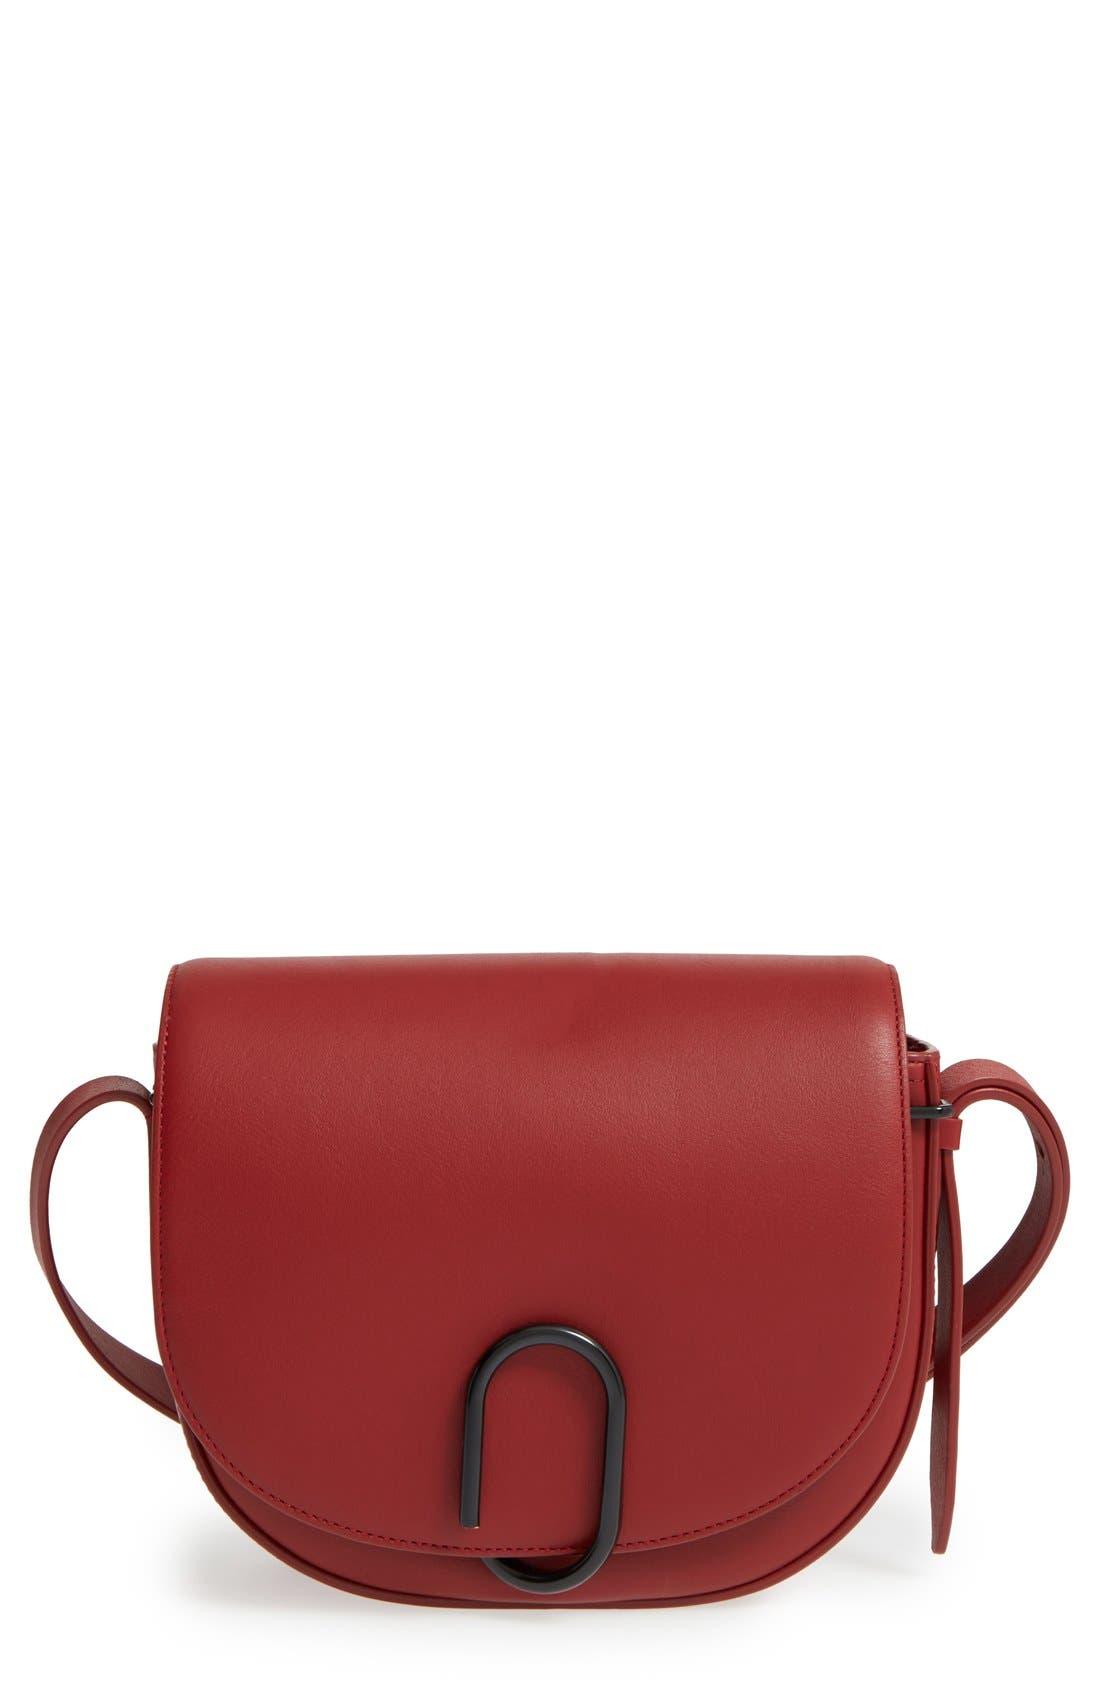 Alix Leather Saddle Bag,                             Main thumbnail 3, color,